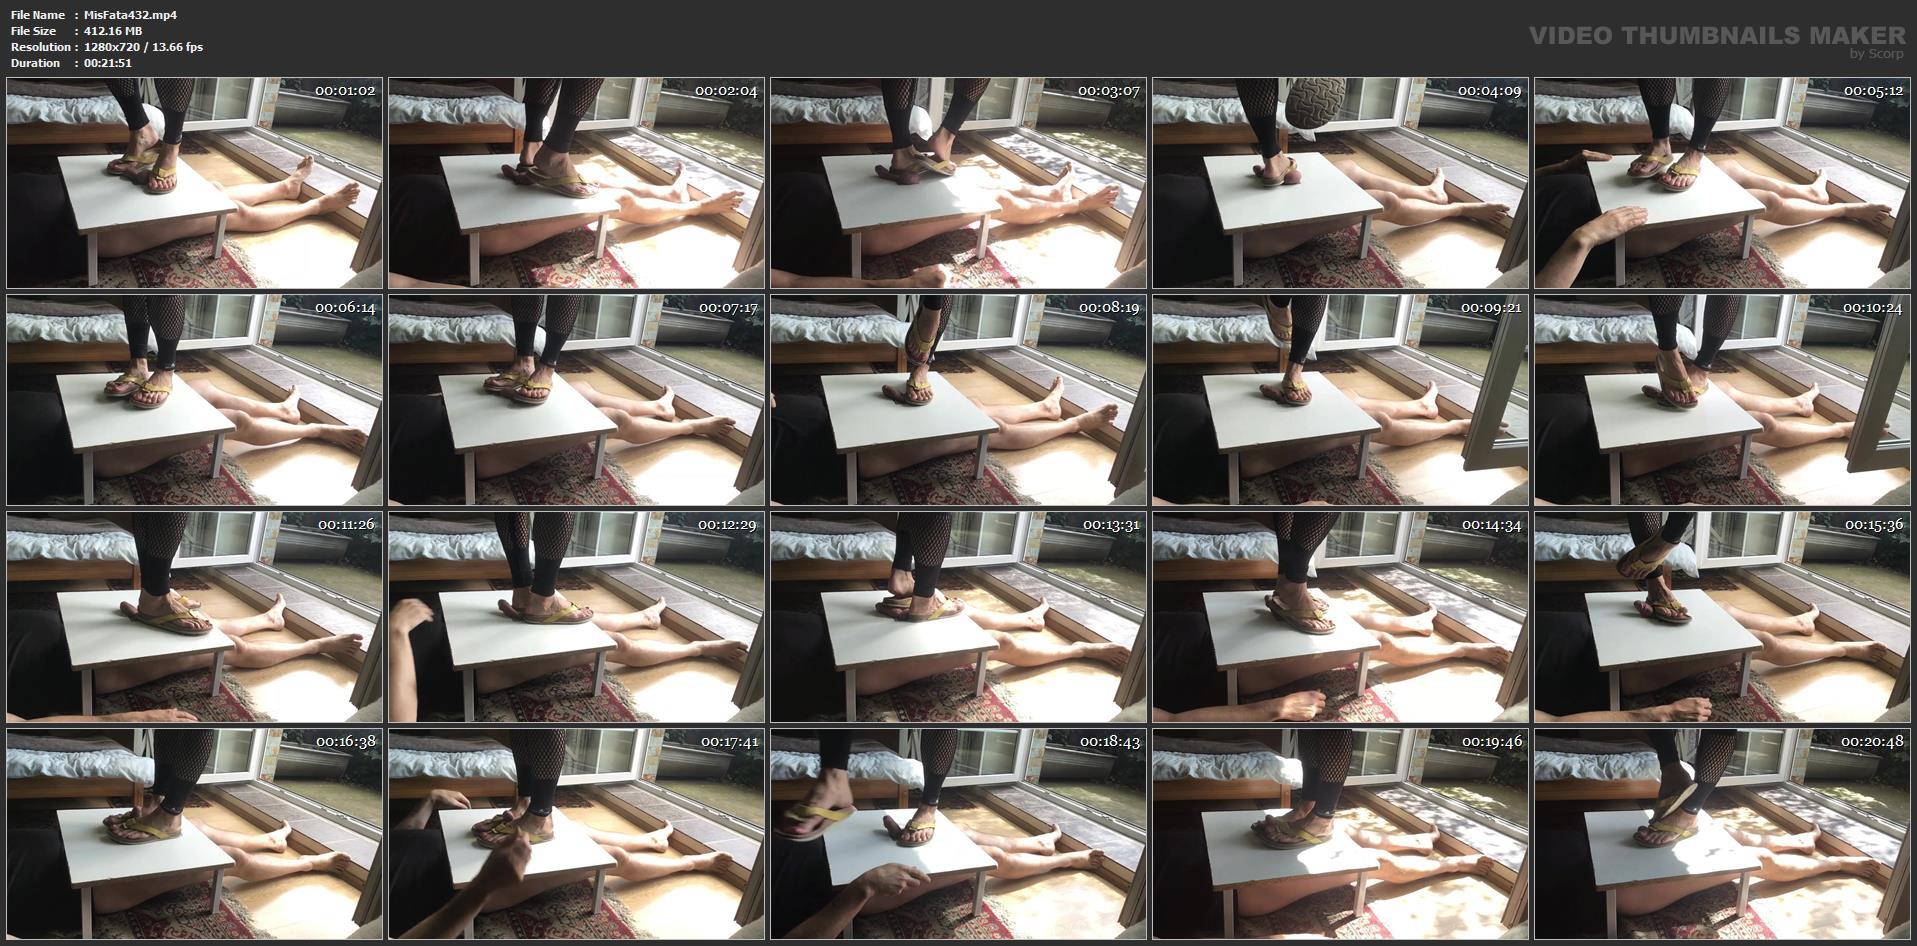 Flip Flops Crush Cock And Balls On Cockboard - MISTRESS FATALIA - HD/720p/MP4